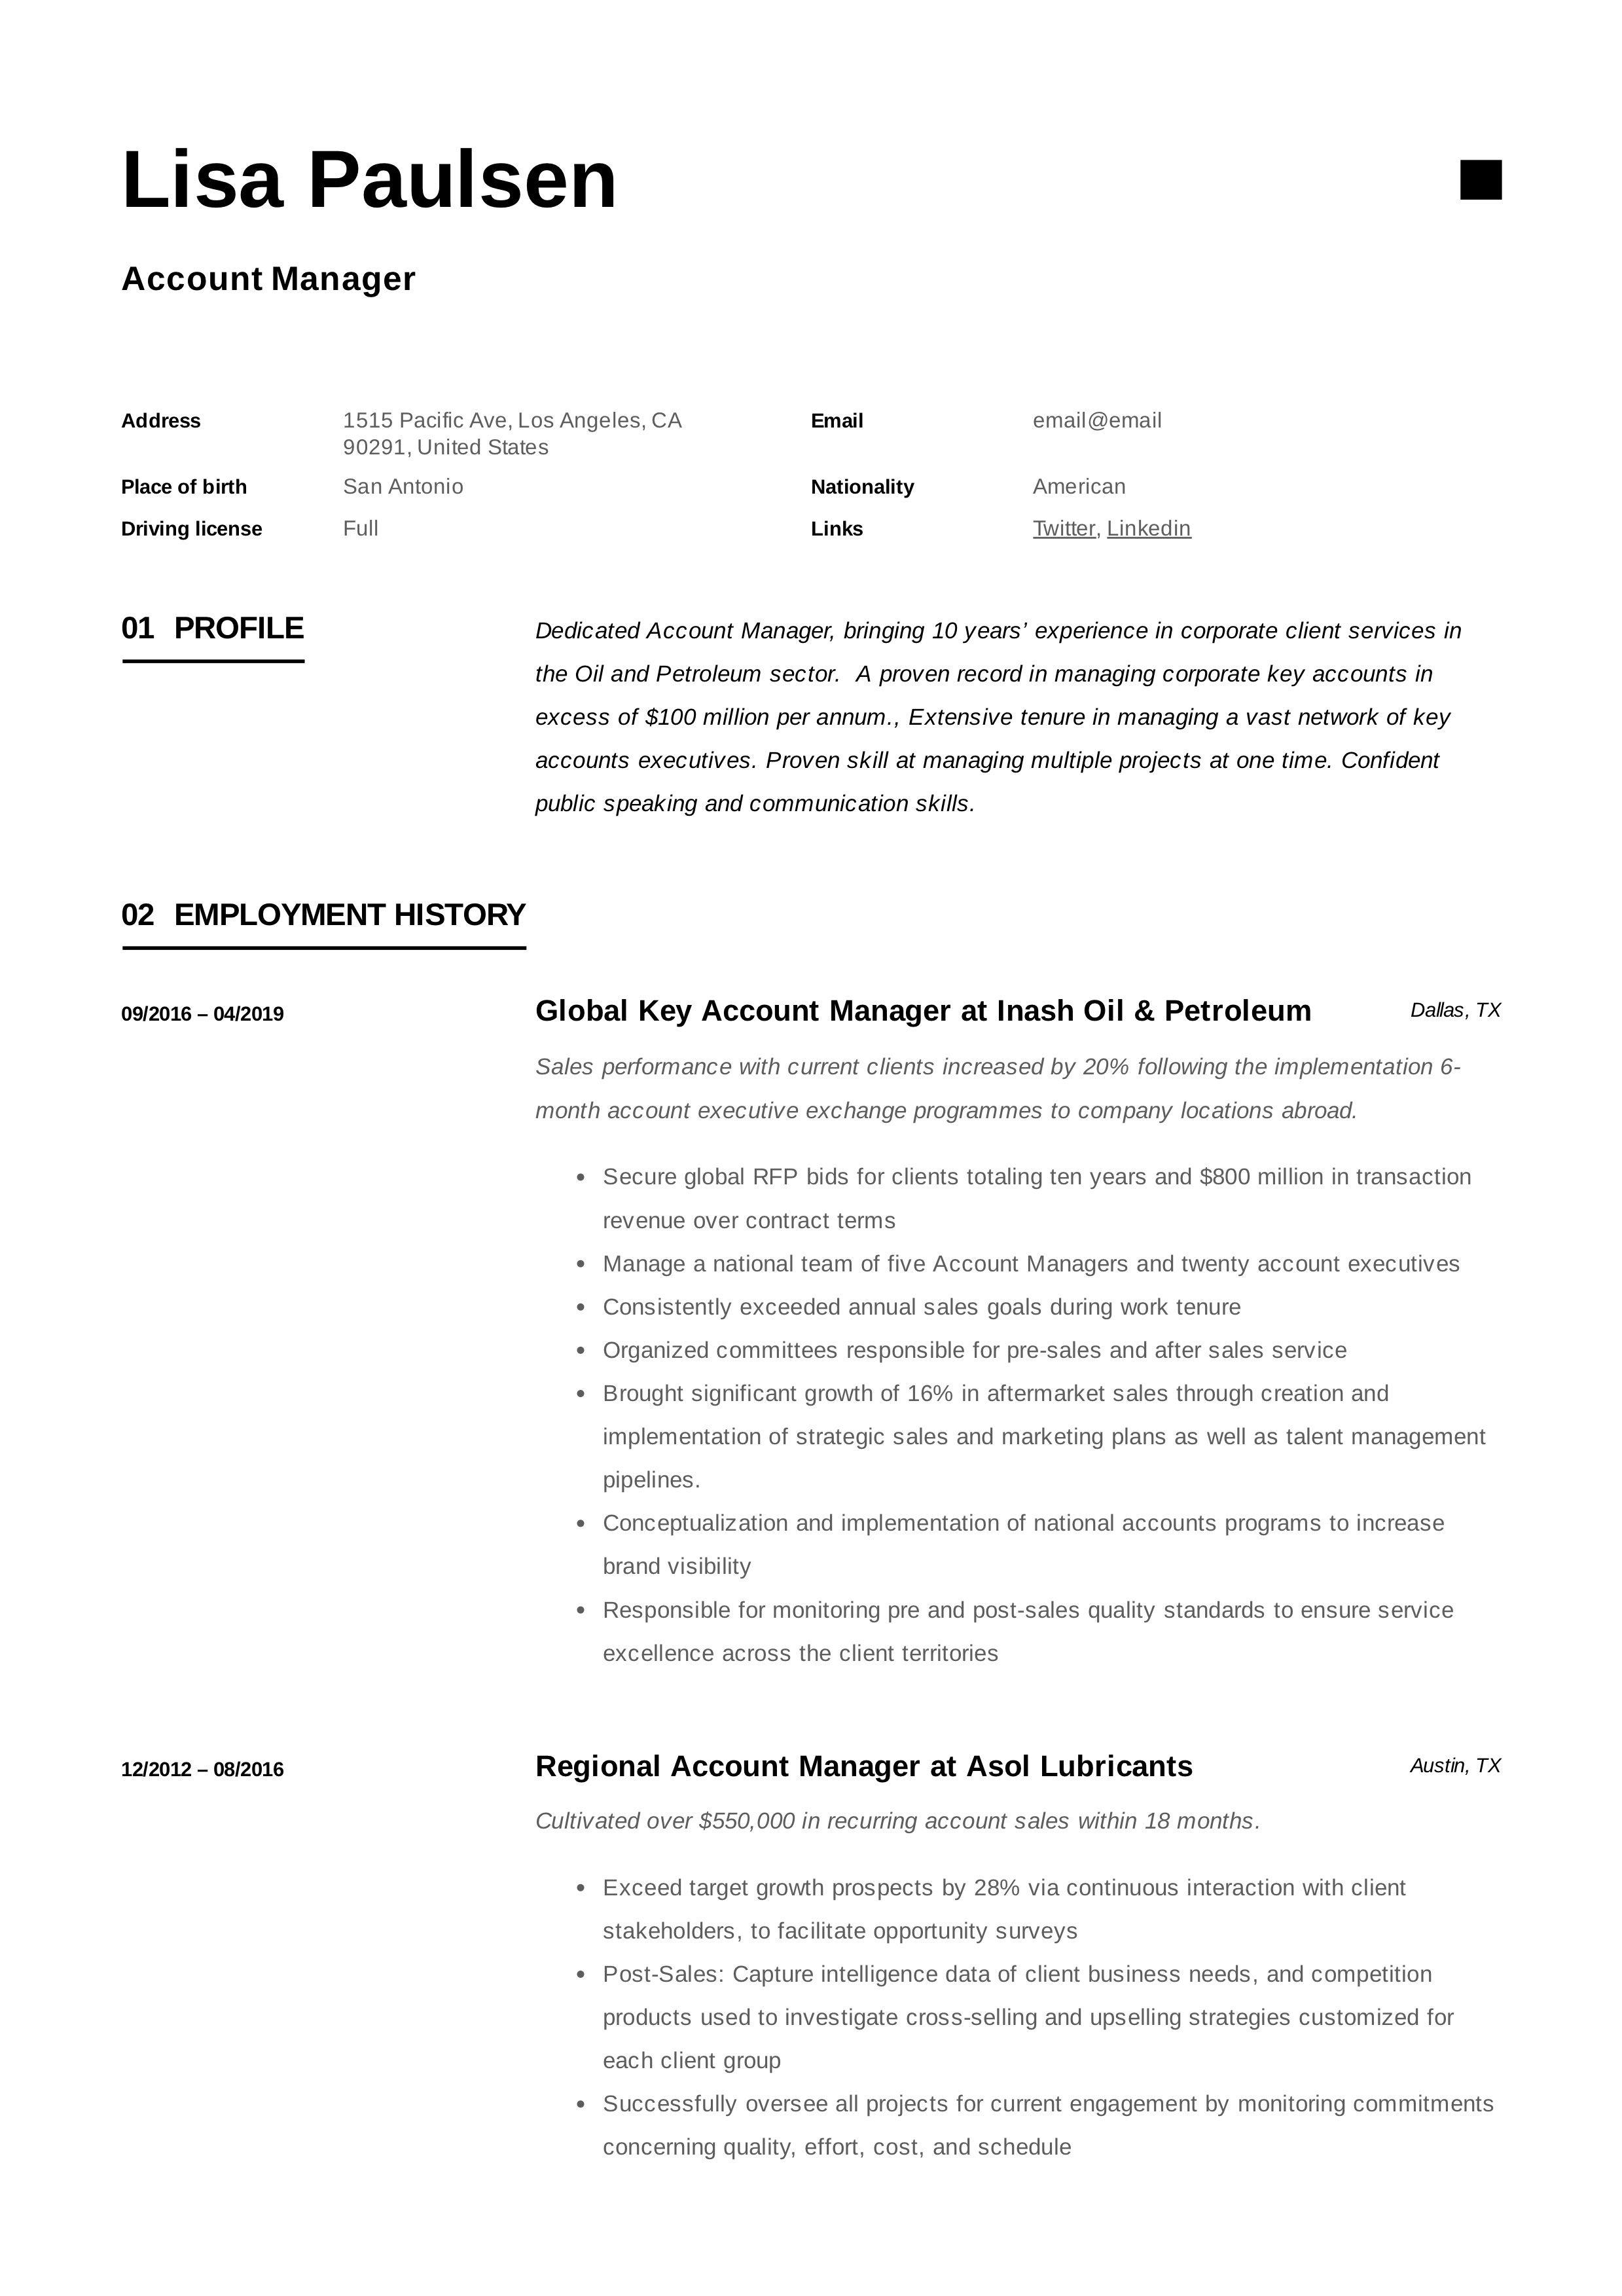 Resume Example English Pdf